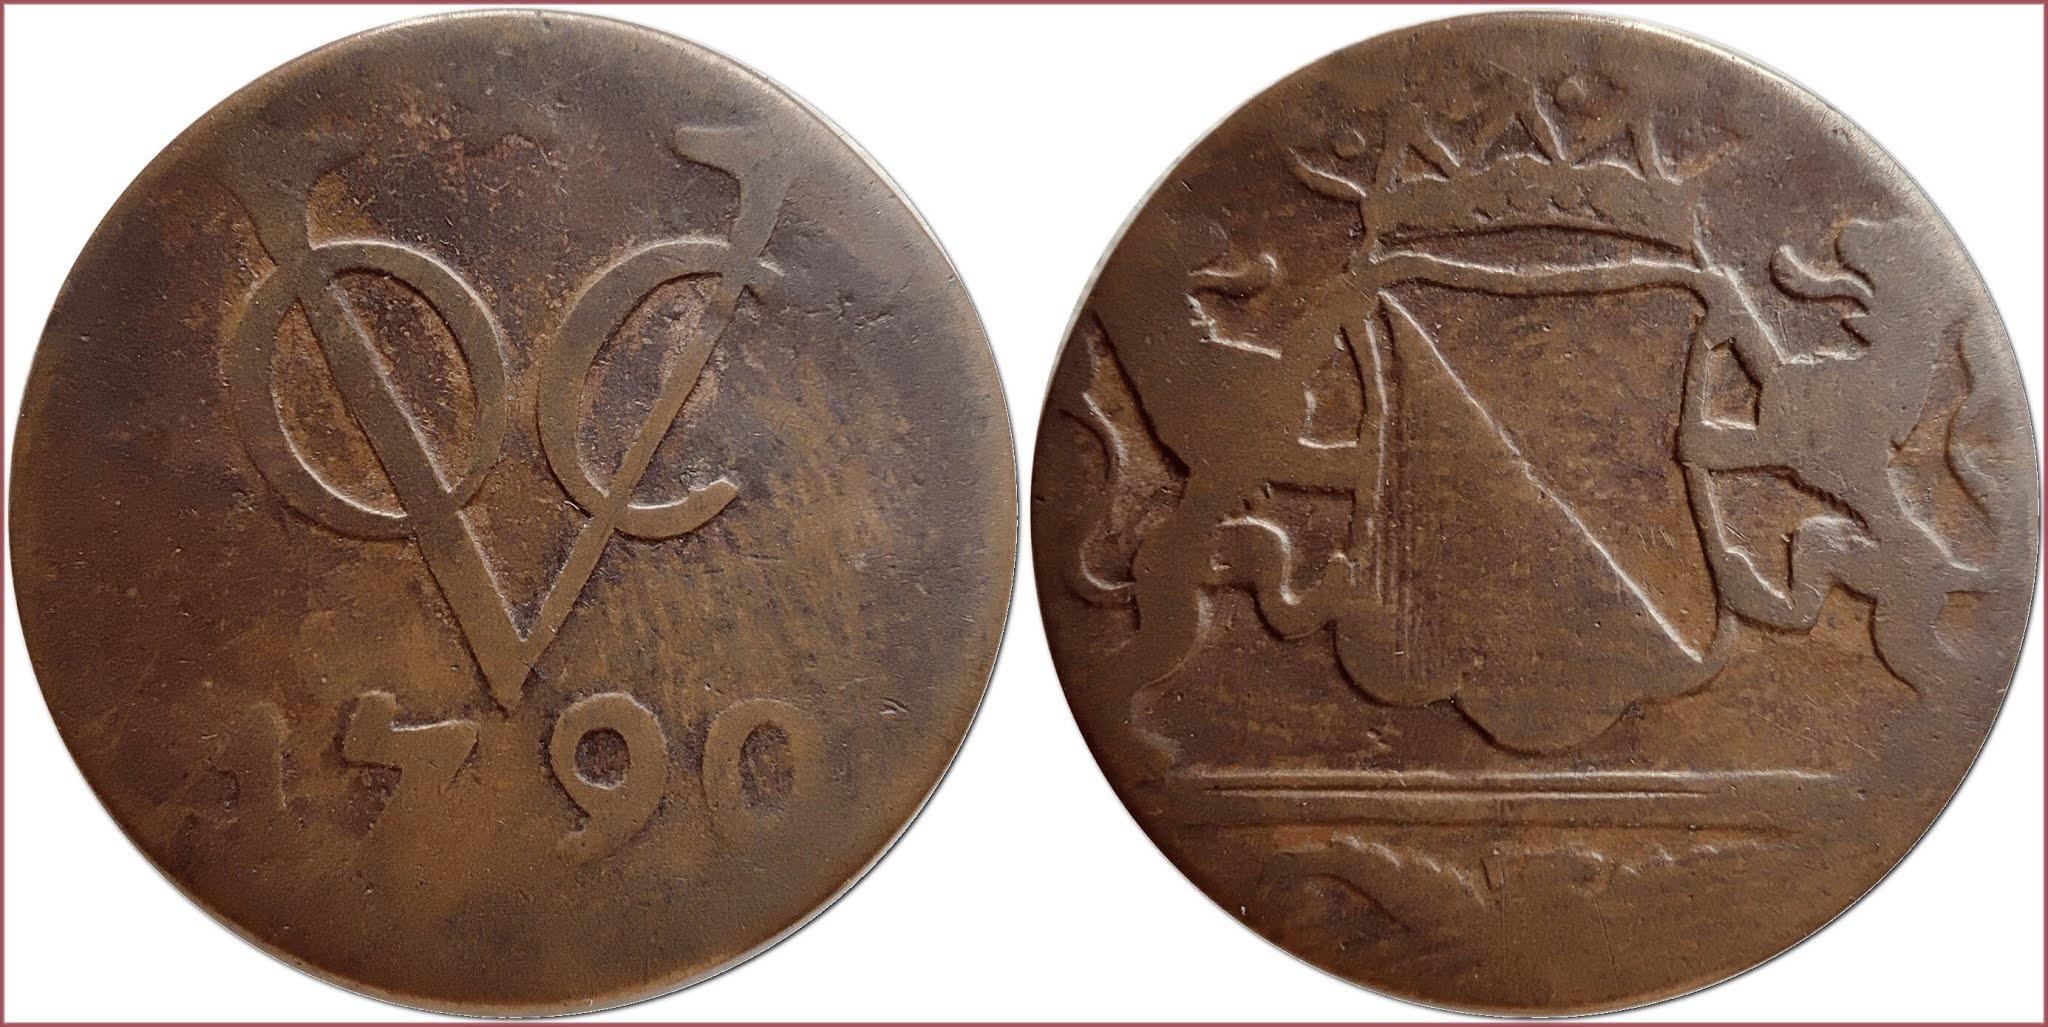 1 duit, 1790: United East India Company (VOC)